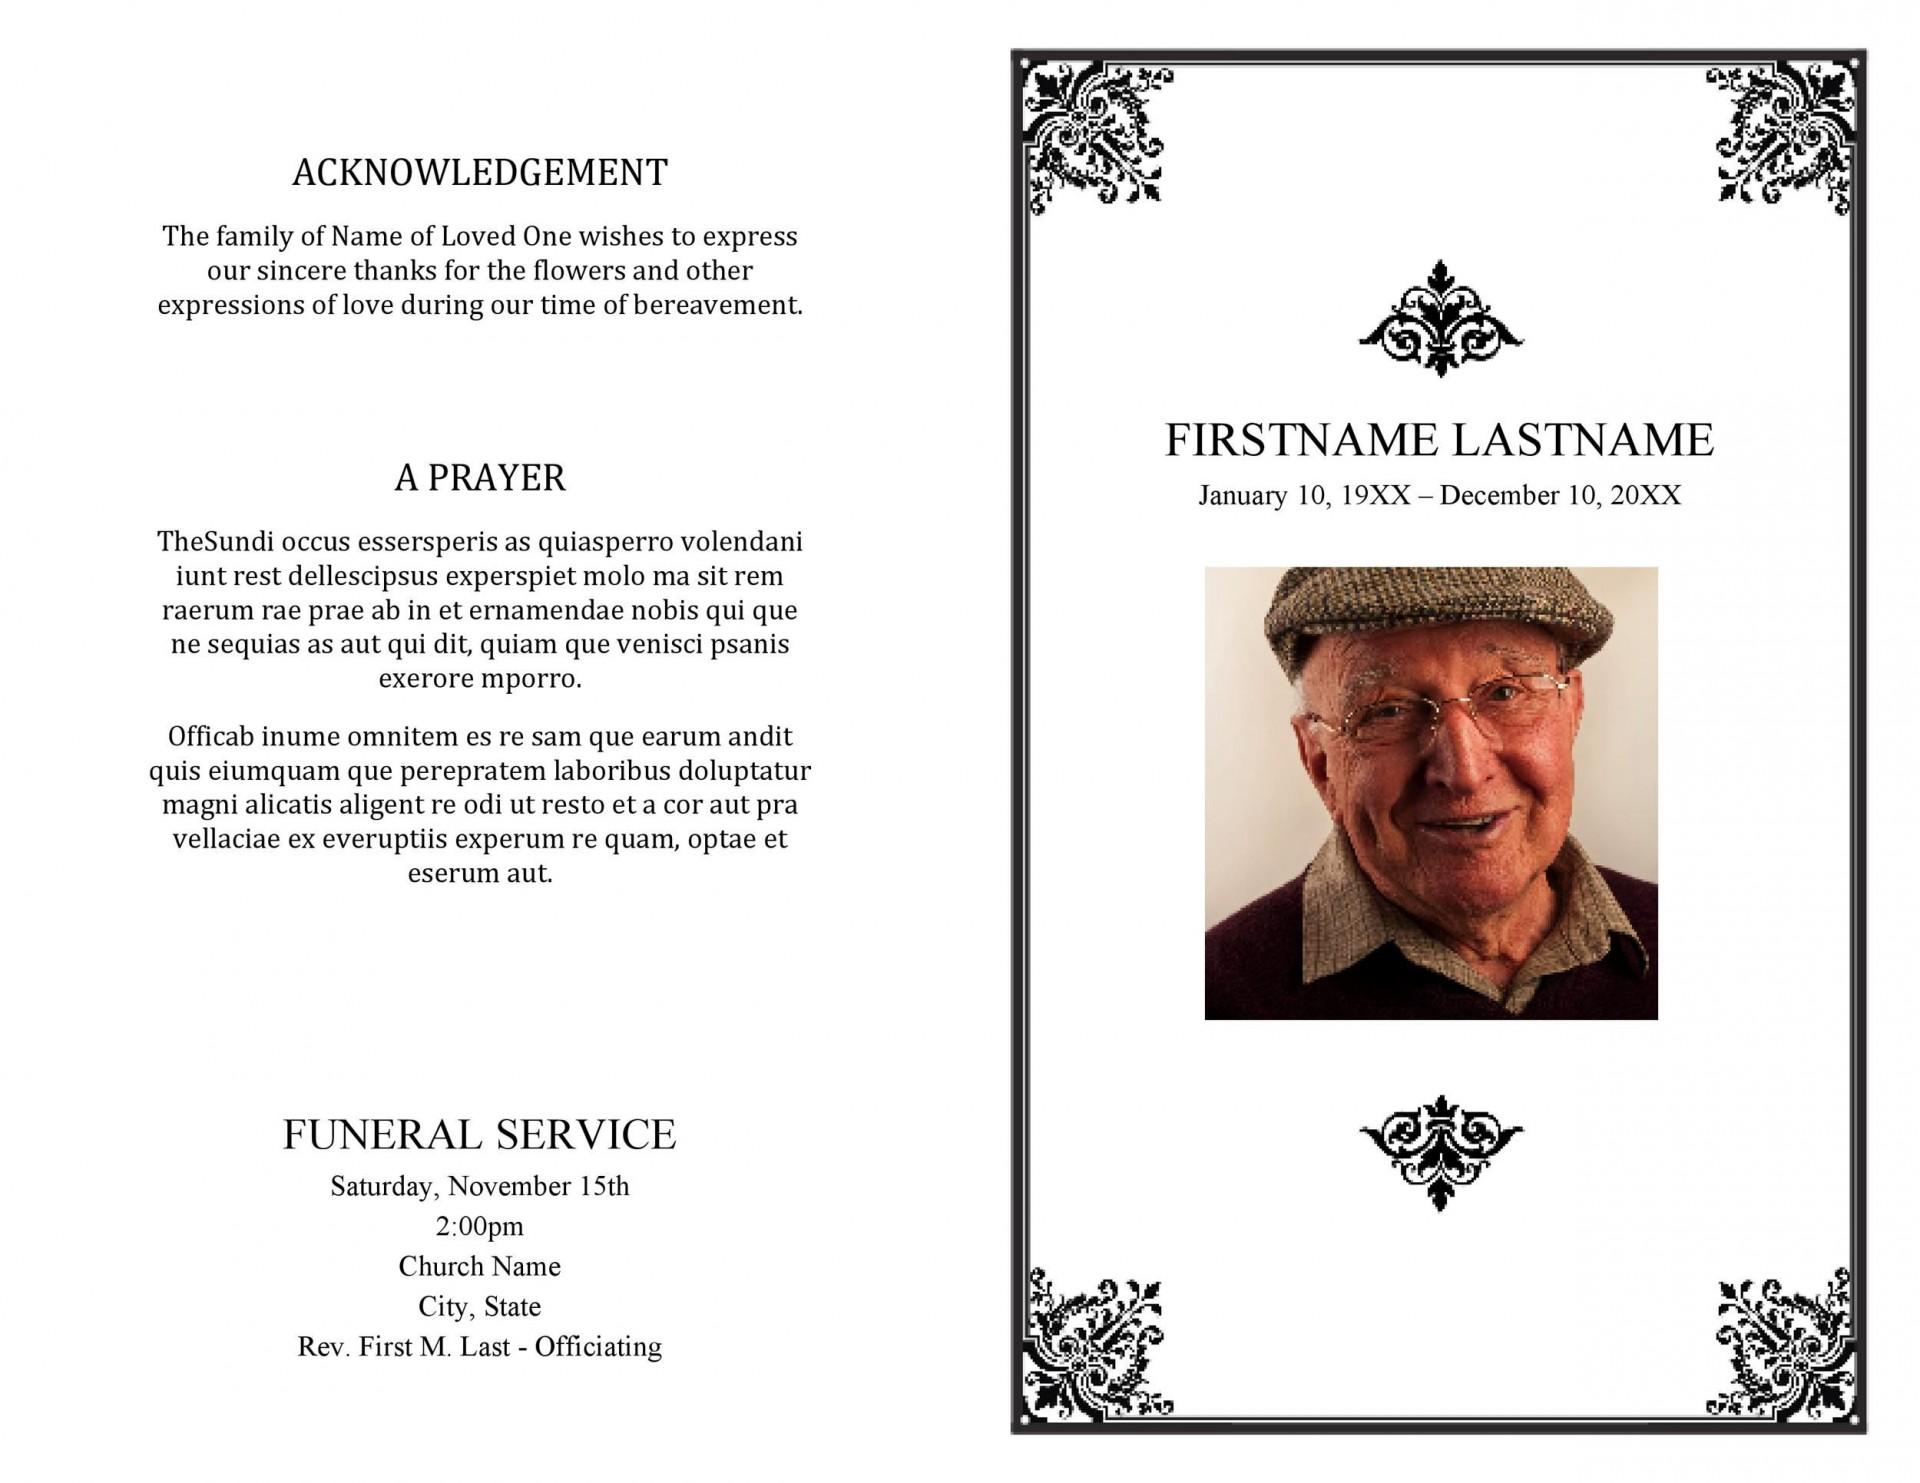 006 Amazing Free Funeral Program Template Photo  Word Catholic Editable Pdf1920